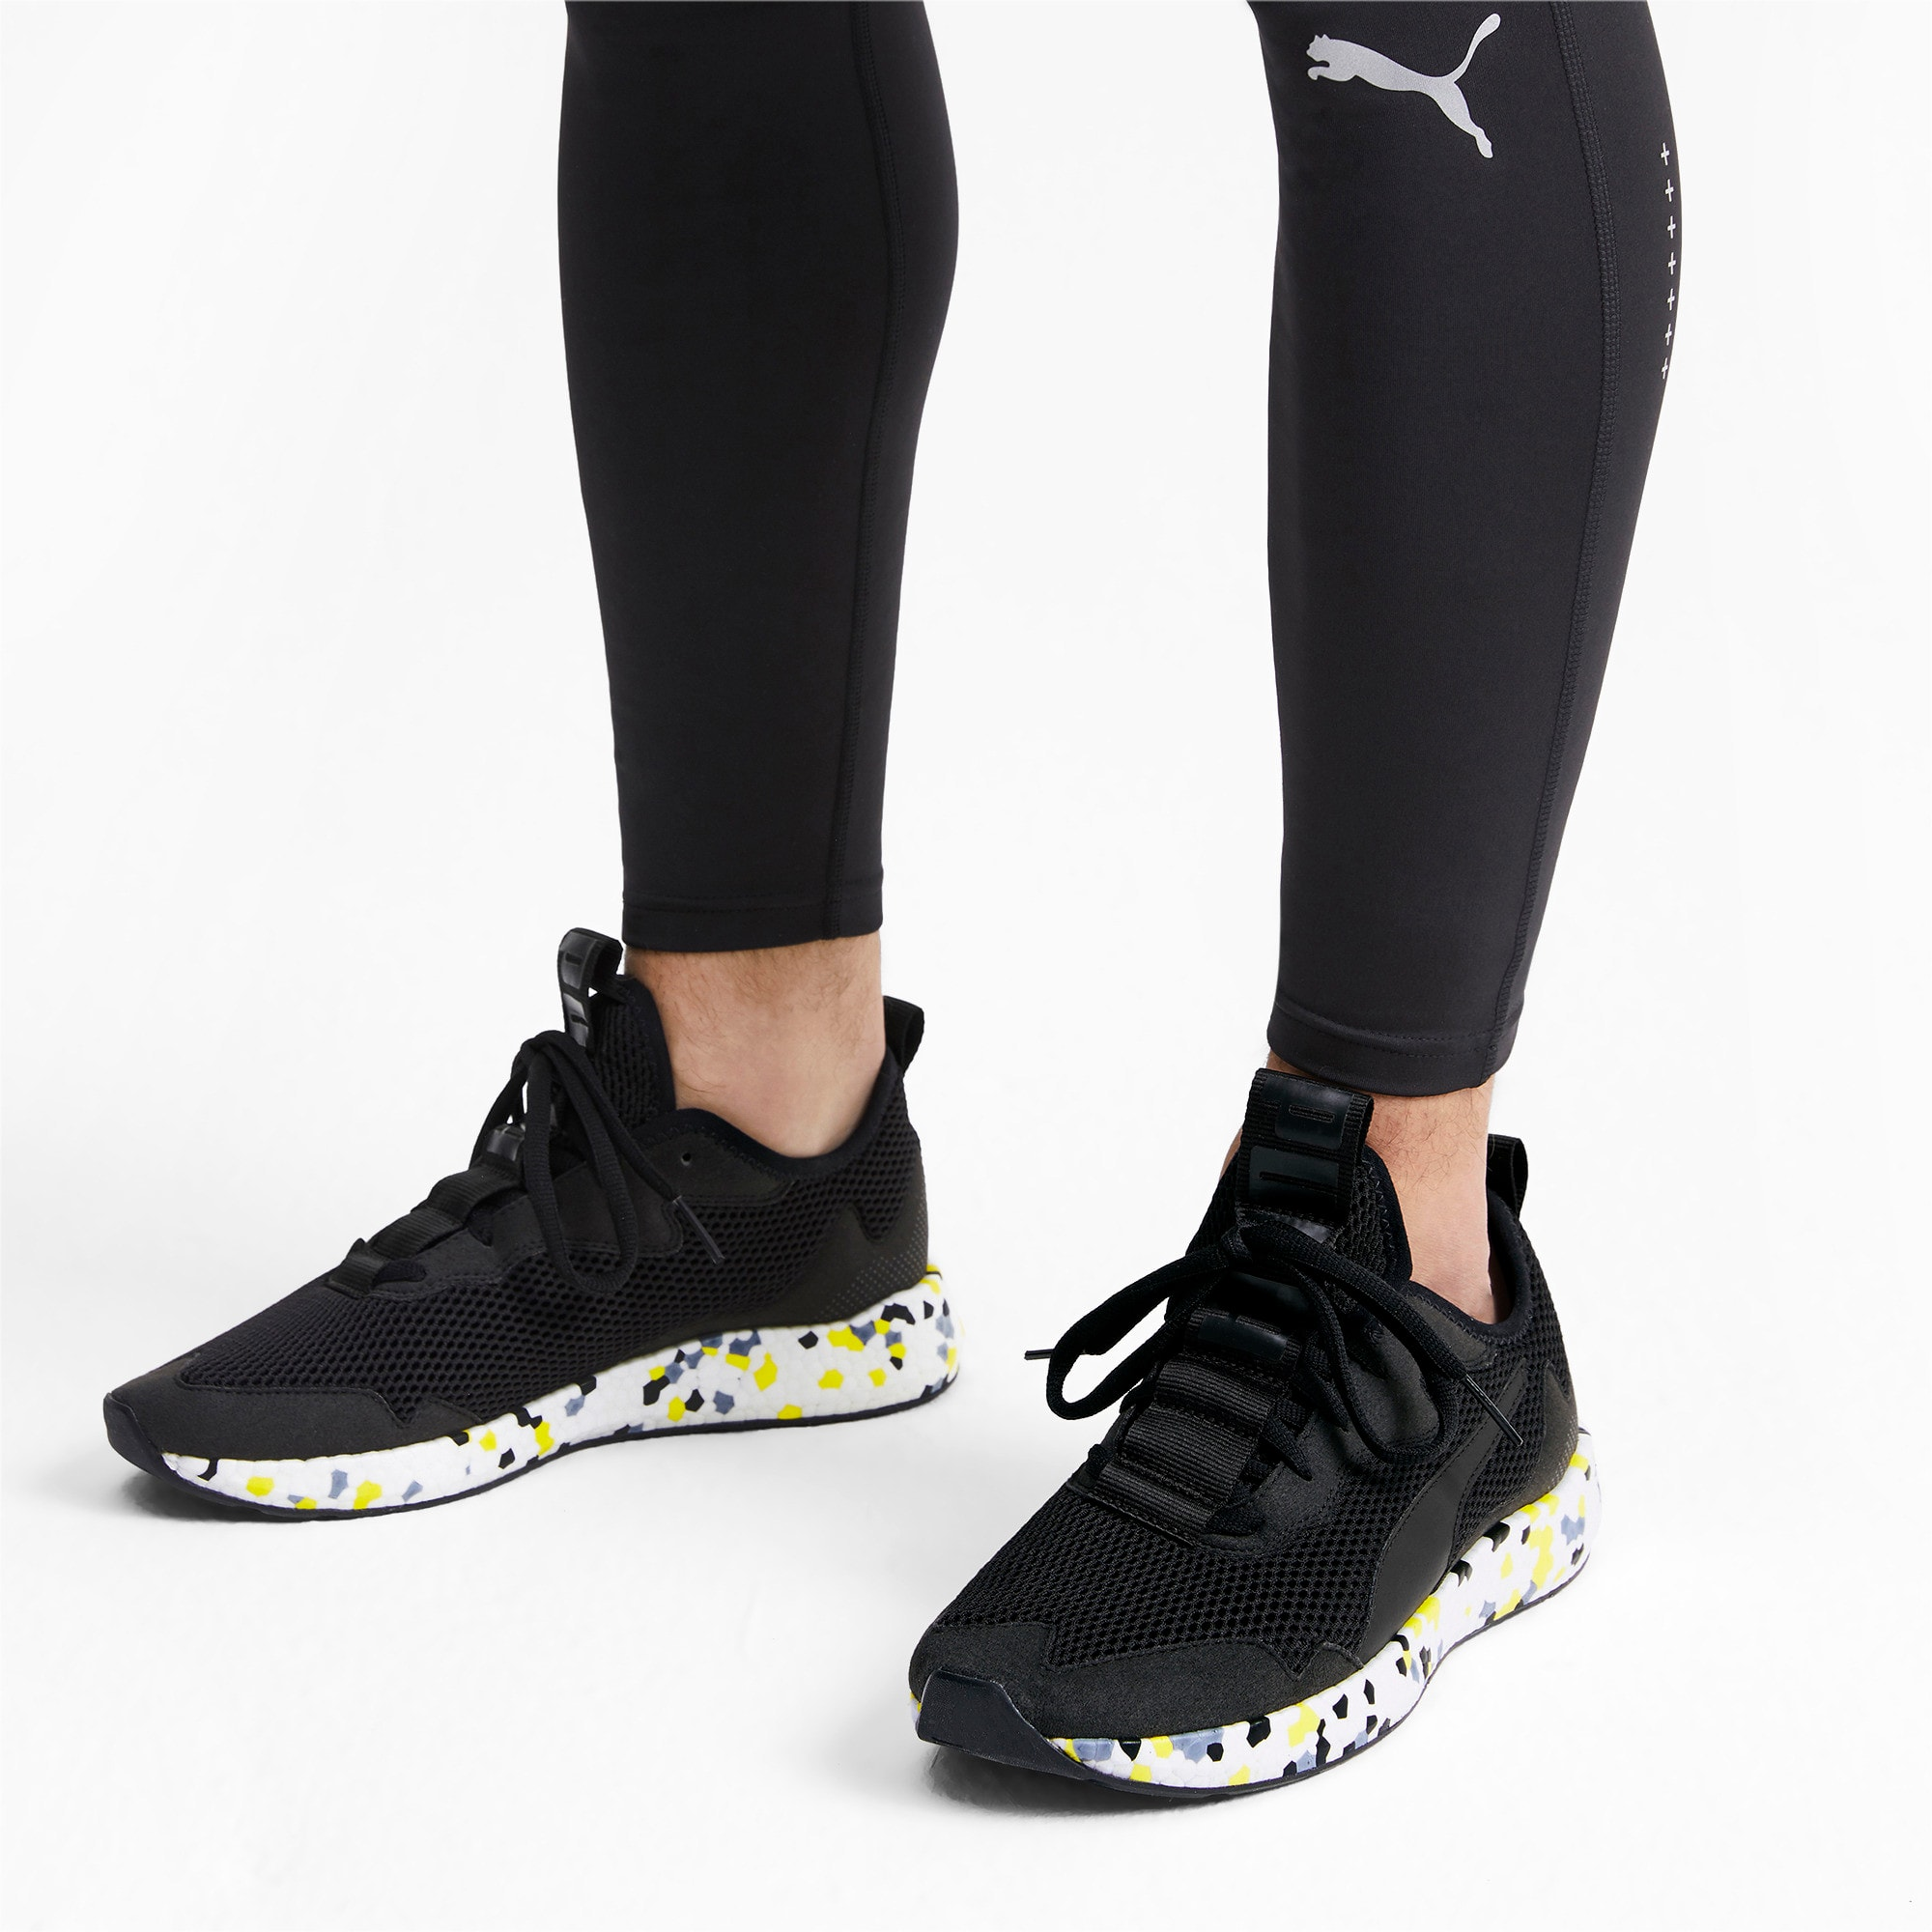 Thumbnail 2 of NRGY Neko Skim Men's Running Shoes, Puma Black-Yellow Alert, medium-IND